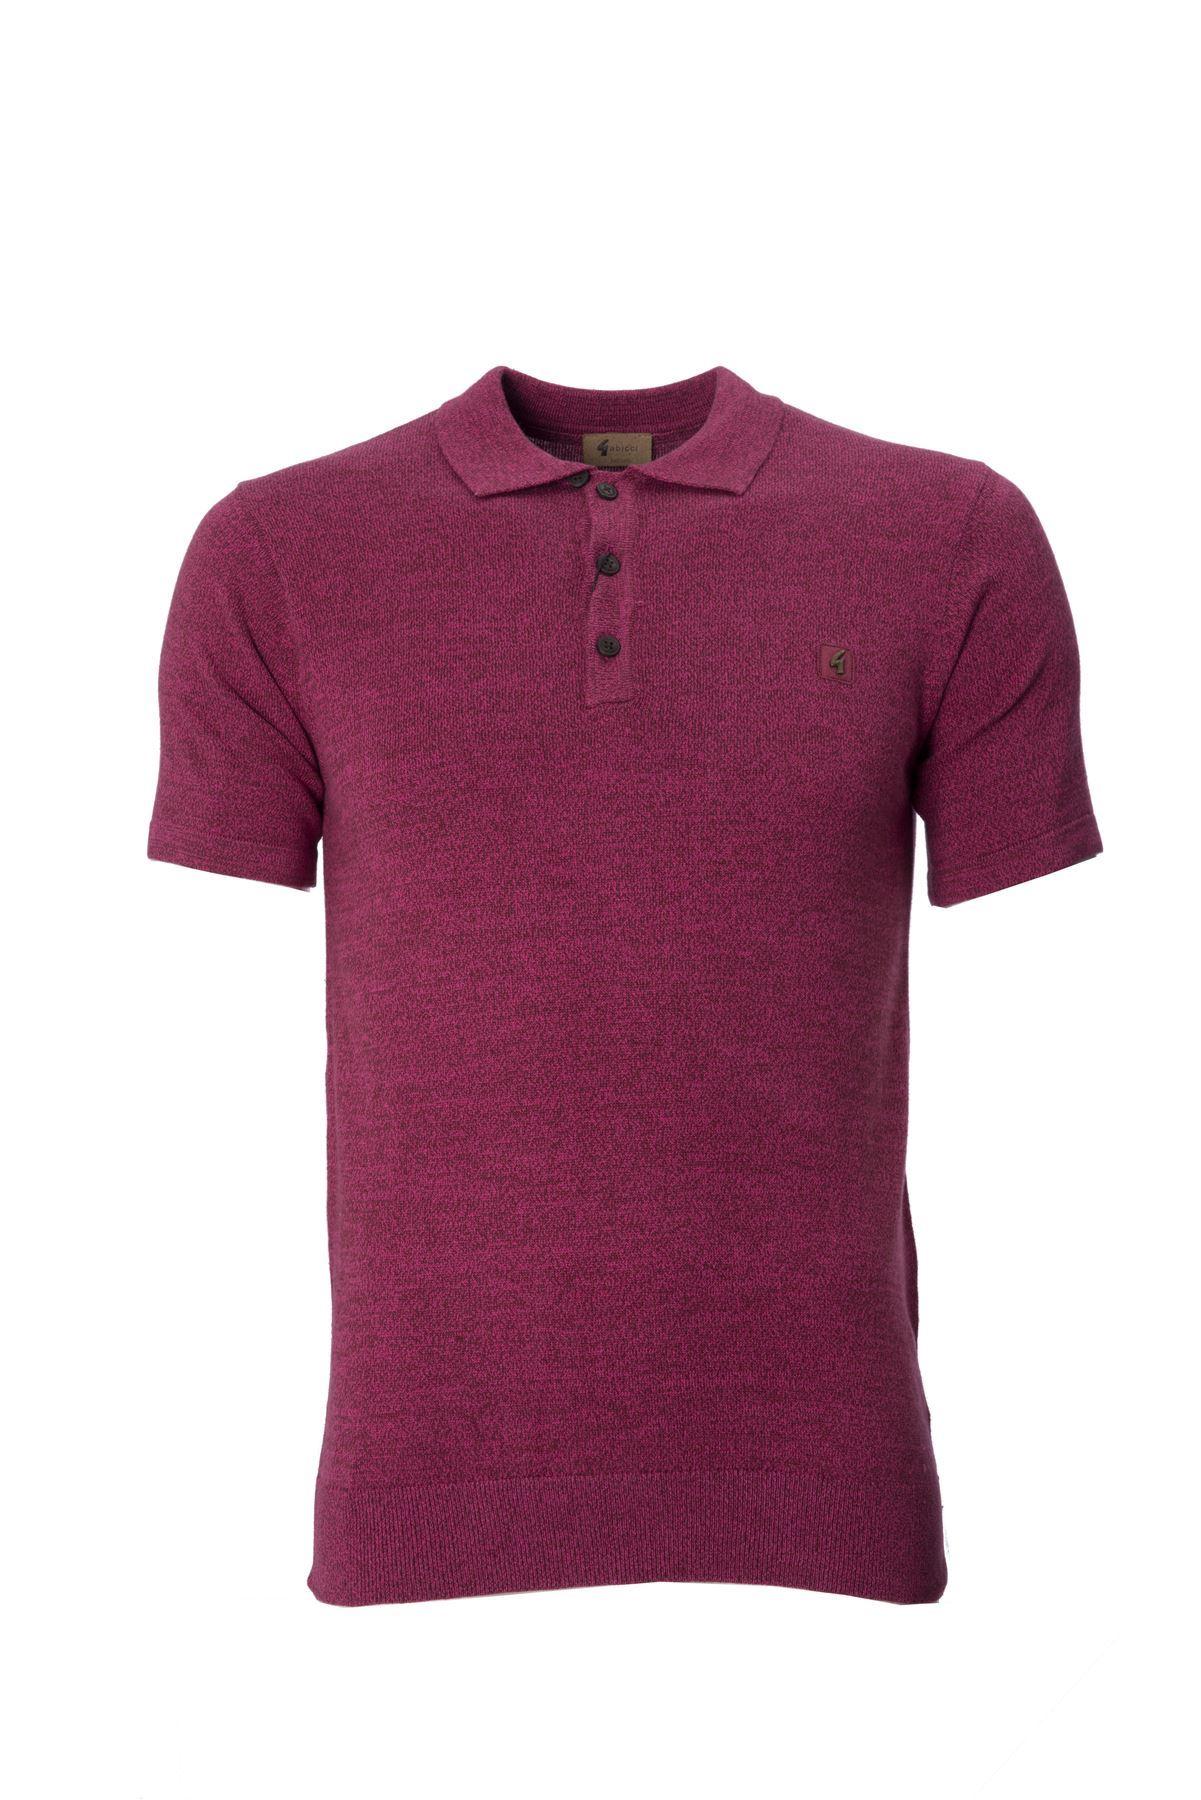 Mens knitted polo shirt collar short sleeve top gabicci ebay for Knitted polo shirt mens